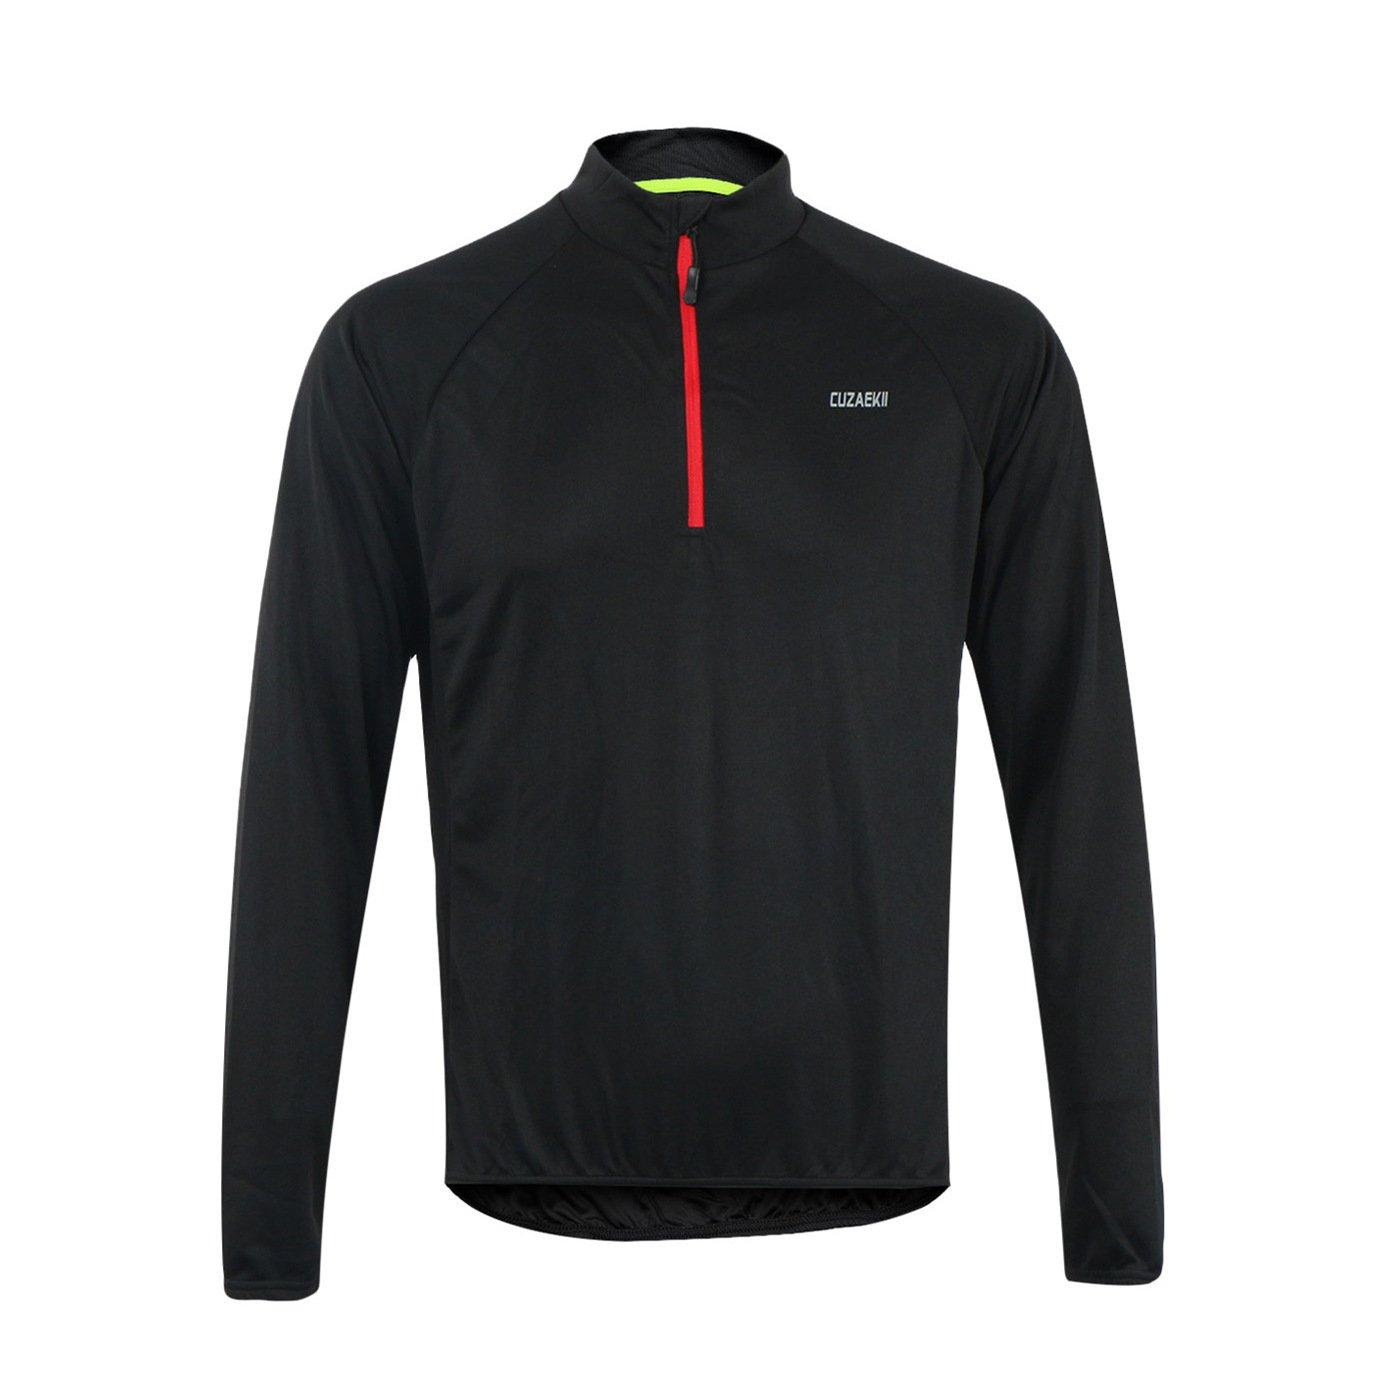 Cuzaekii Mens Long Sleeve Cycling Jersey MTB Bike Shirt Clothing for Summer /& Cool Weather